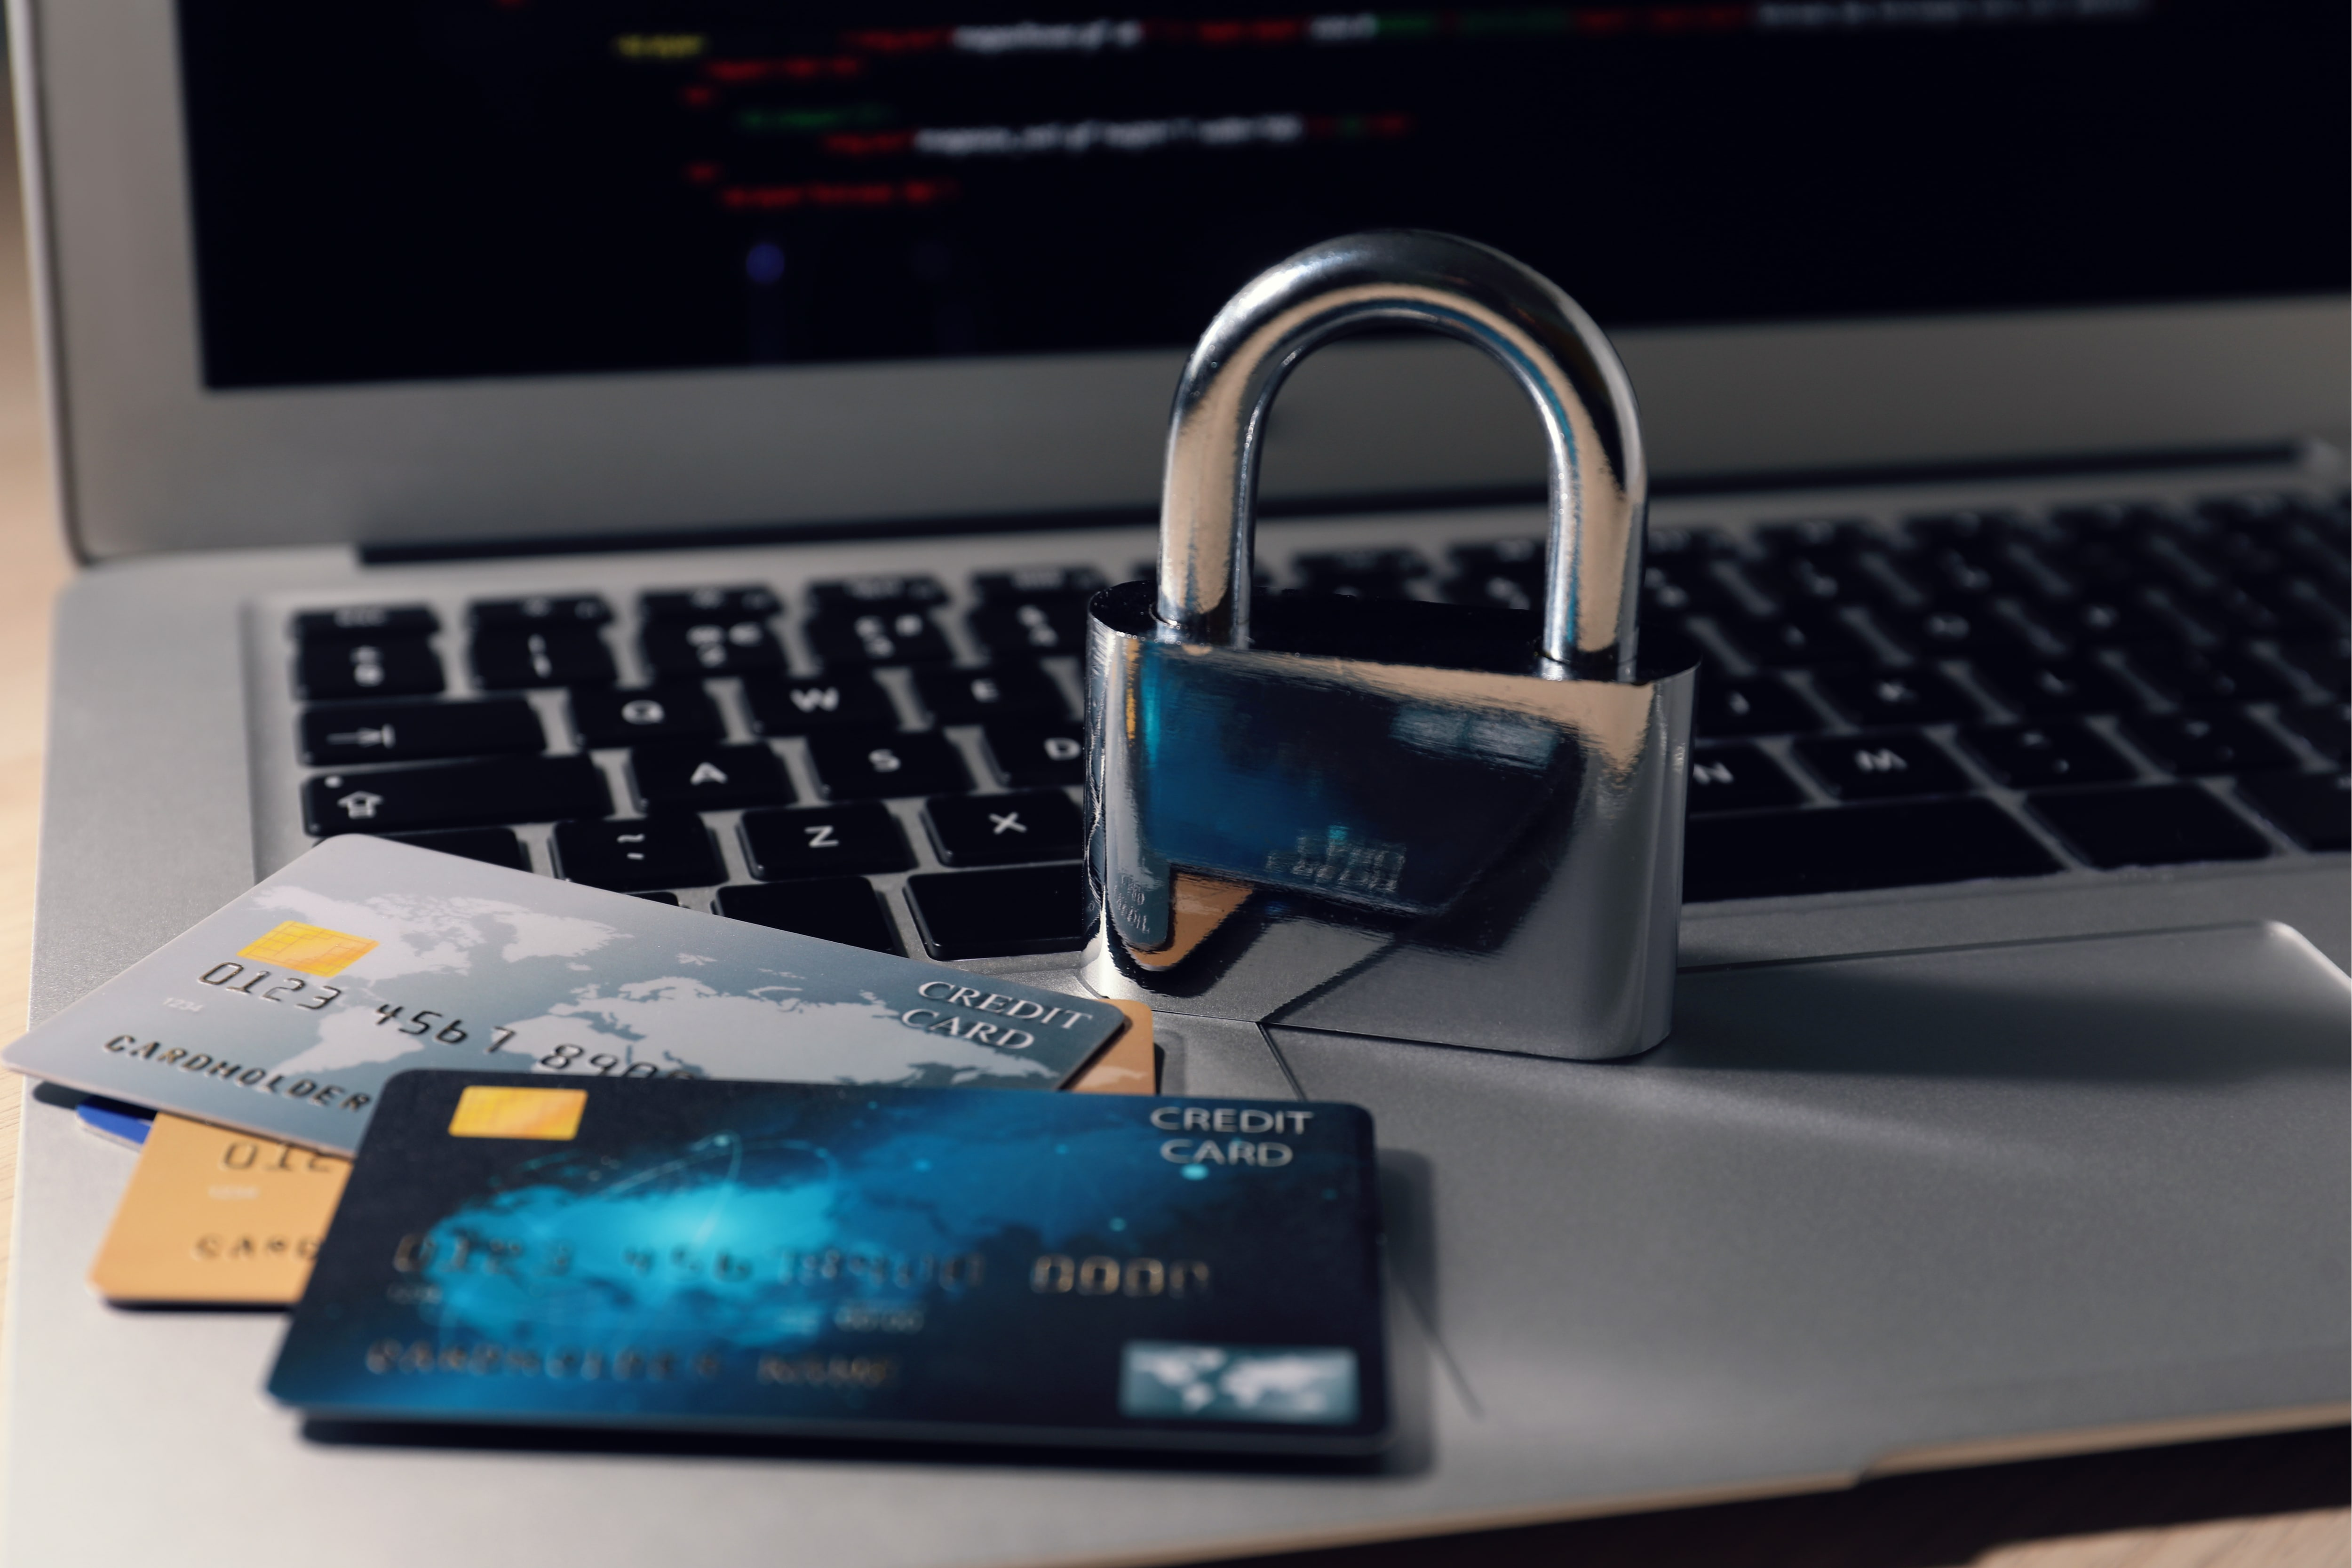 Identity theft criminal